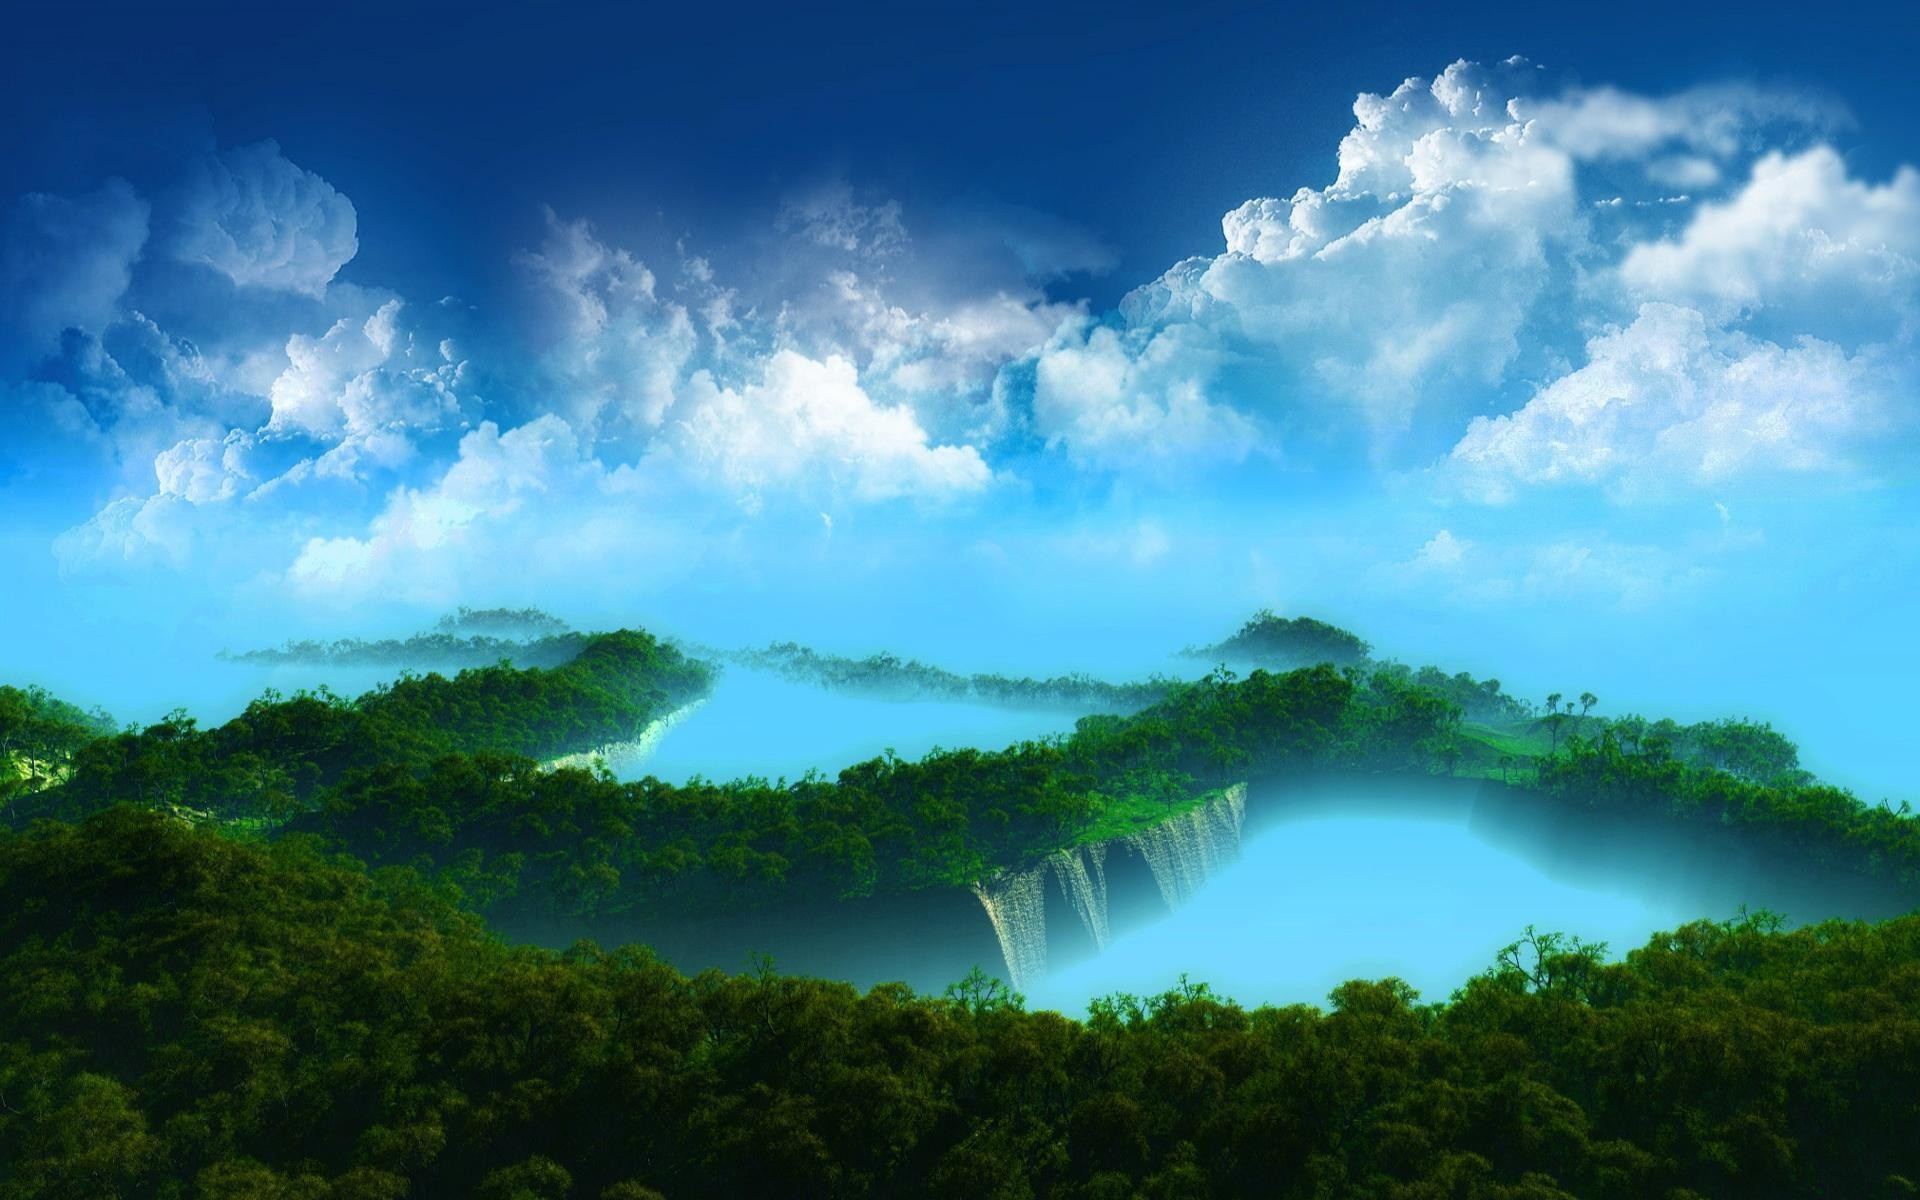 50 Free Very Beautiful Desktop Backgrounds That Look Amazingly